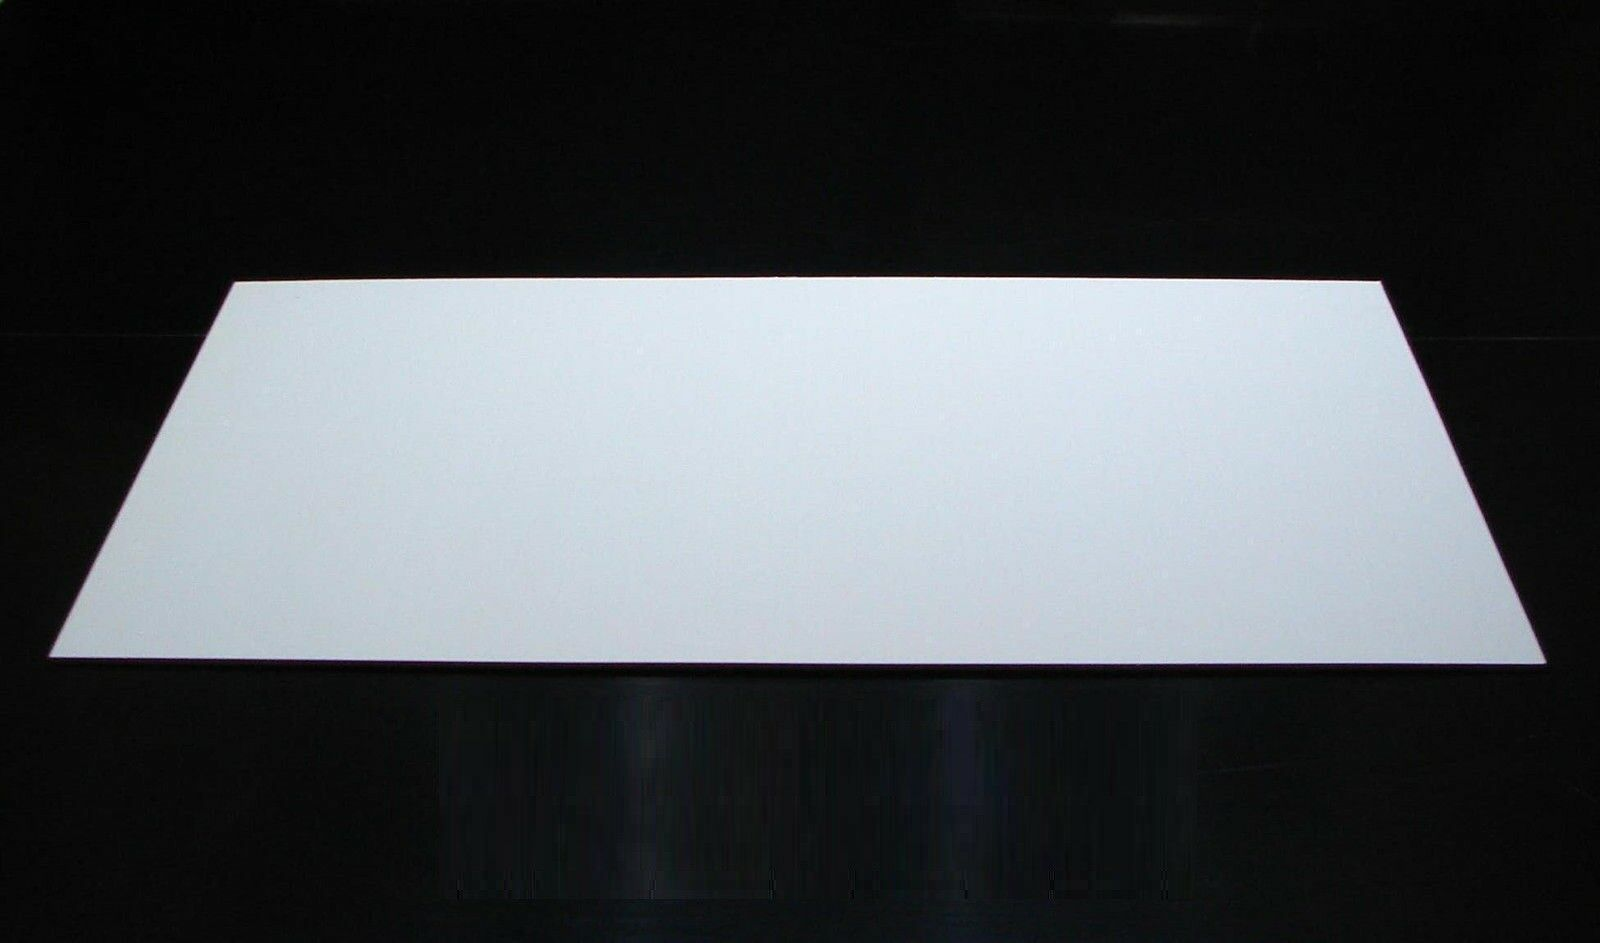 GFK Kunststoffplatte bis 2,1 m fiberglas lang weiß fiberglas m a549ab